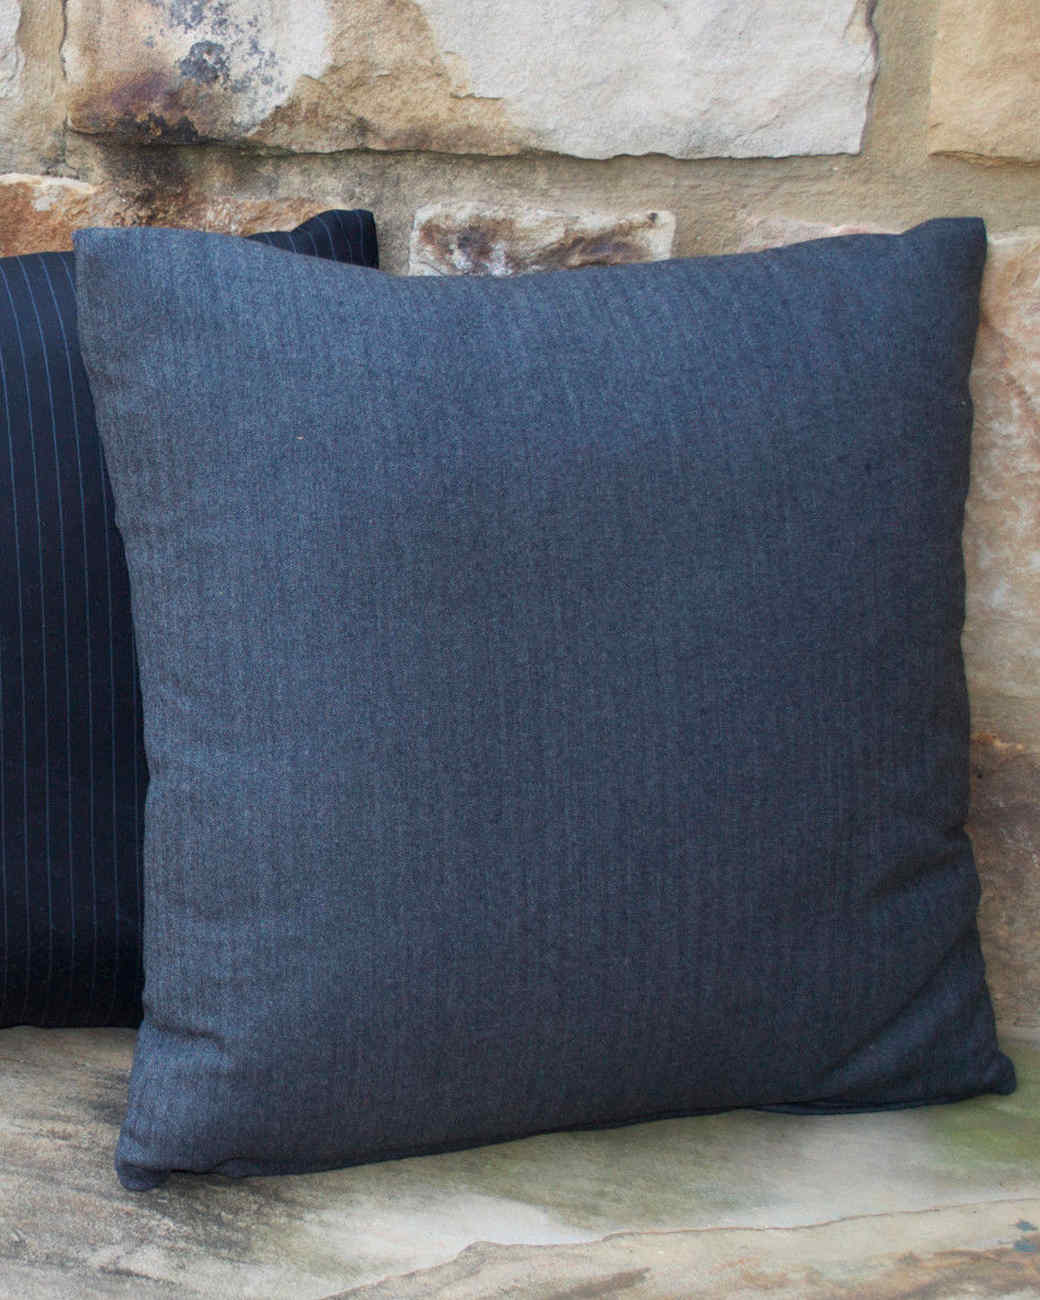 graybill-downs-herringbone-pillow-0514.jpg